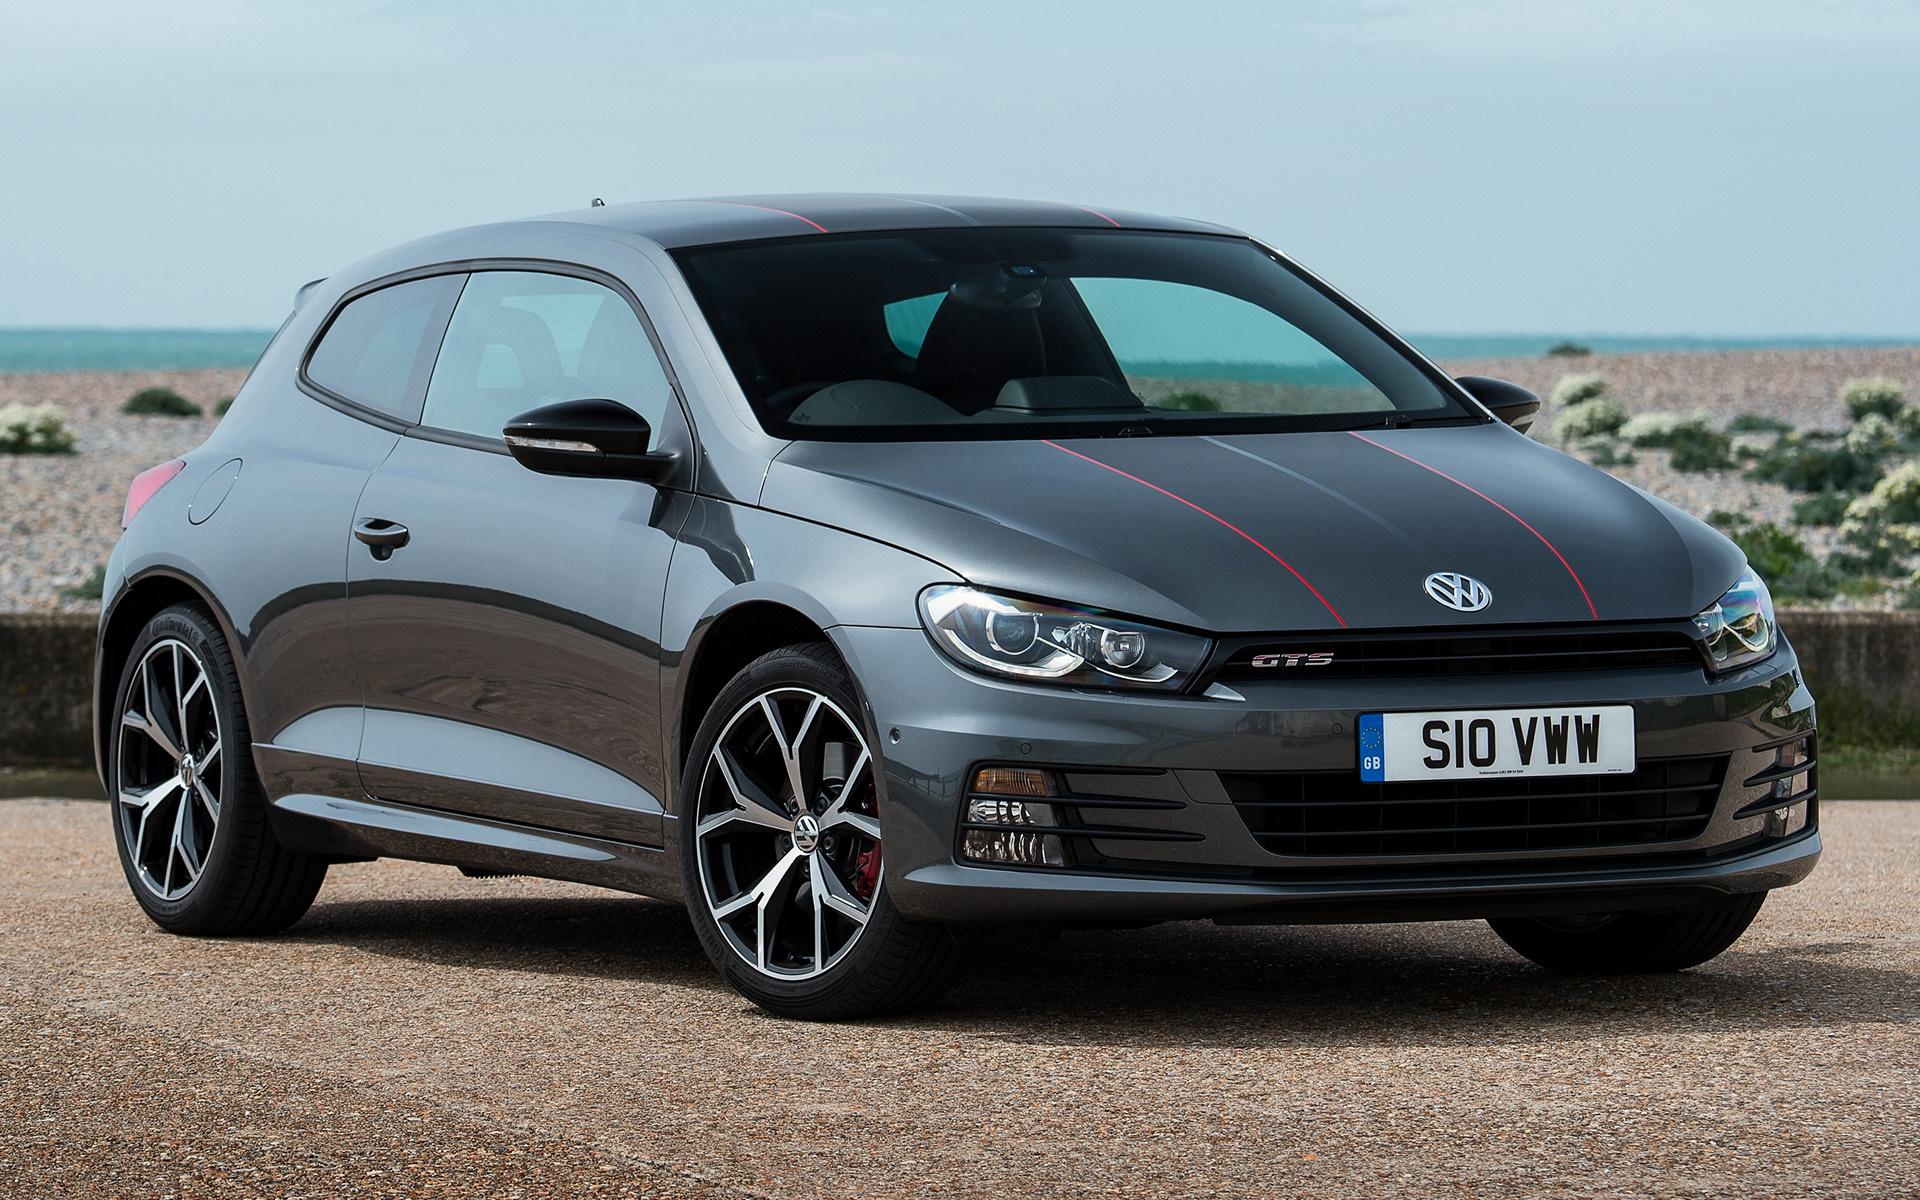 Genesis Sports Car >> 2016 Volkswagen Scirocco GTS (UK) - Wallpapers and HD Images | Car Pixel